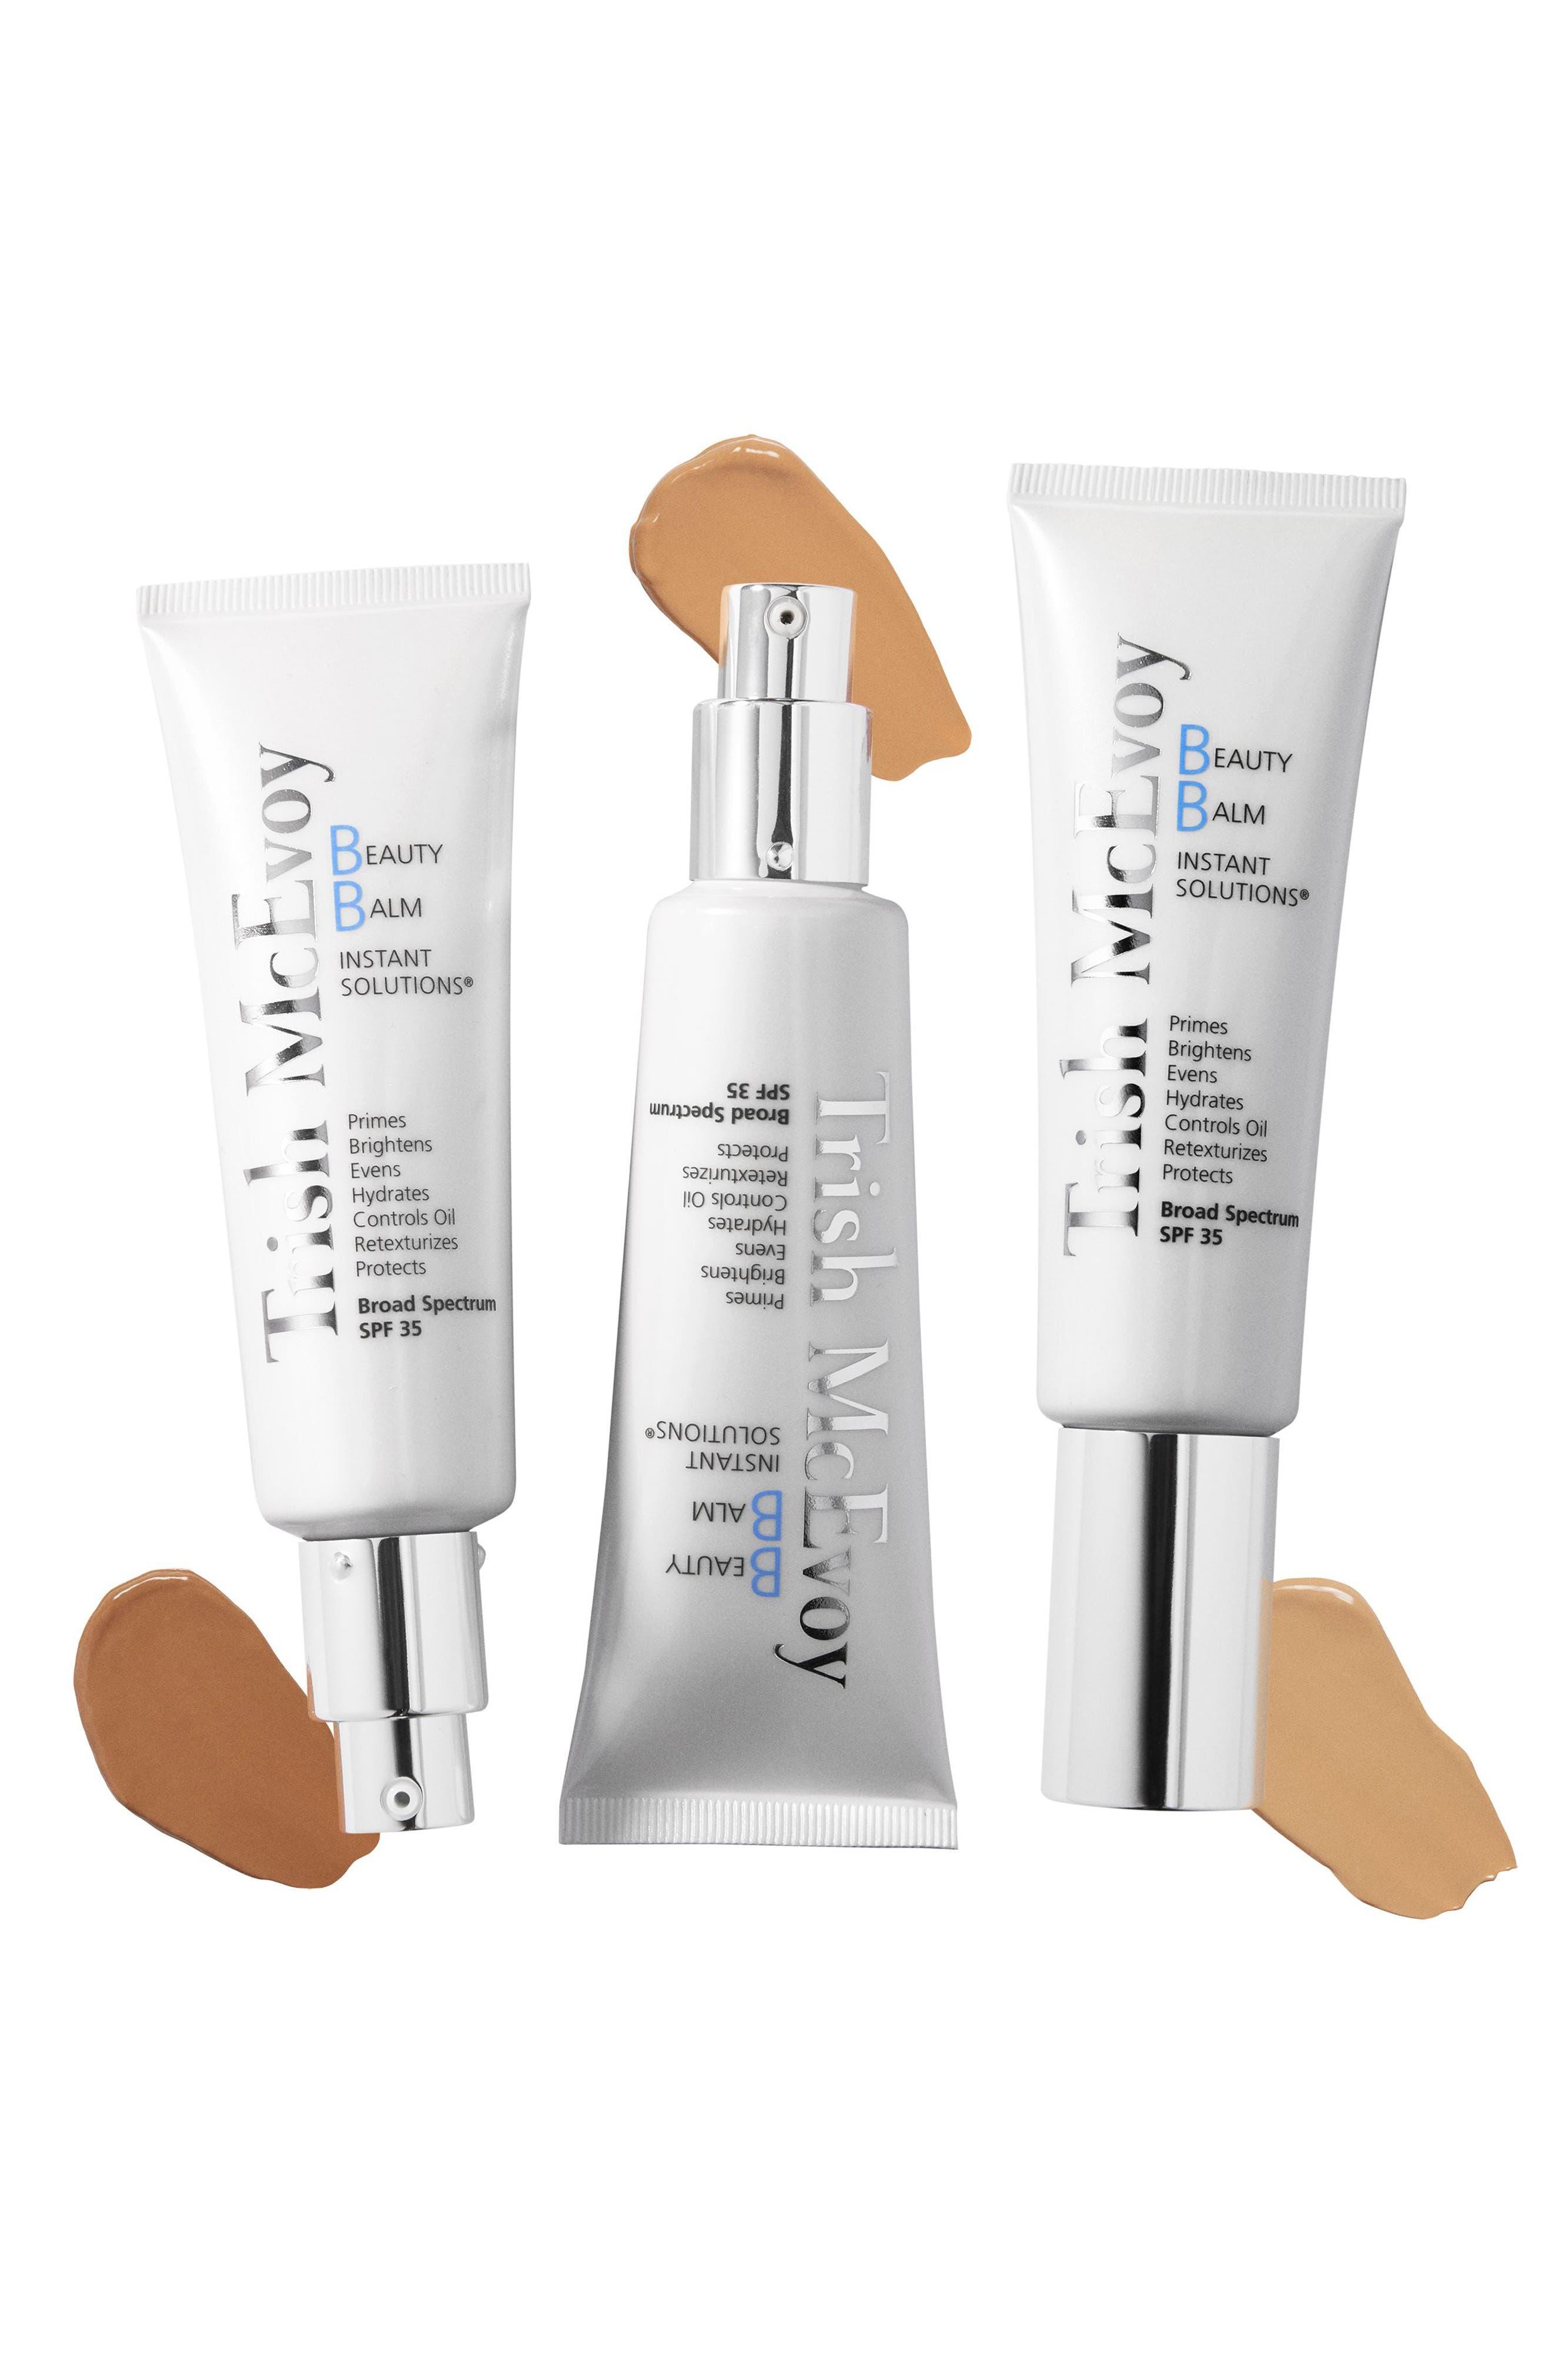 Alternate Image 2  - Trish McEvoy Beauty Balm Instant Solutions® SPF 35